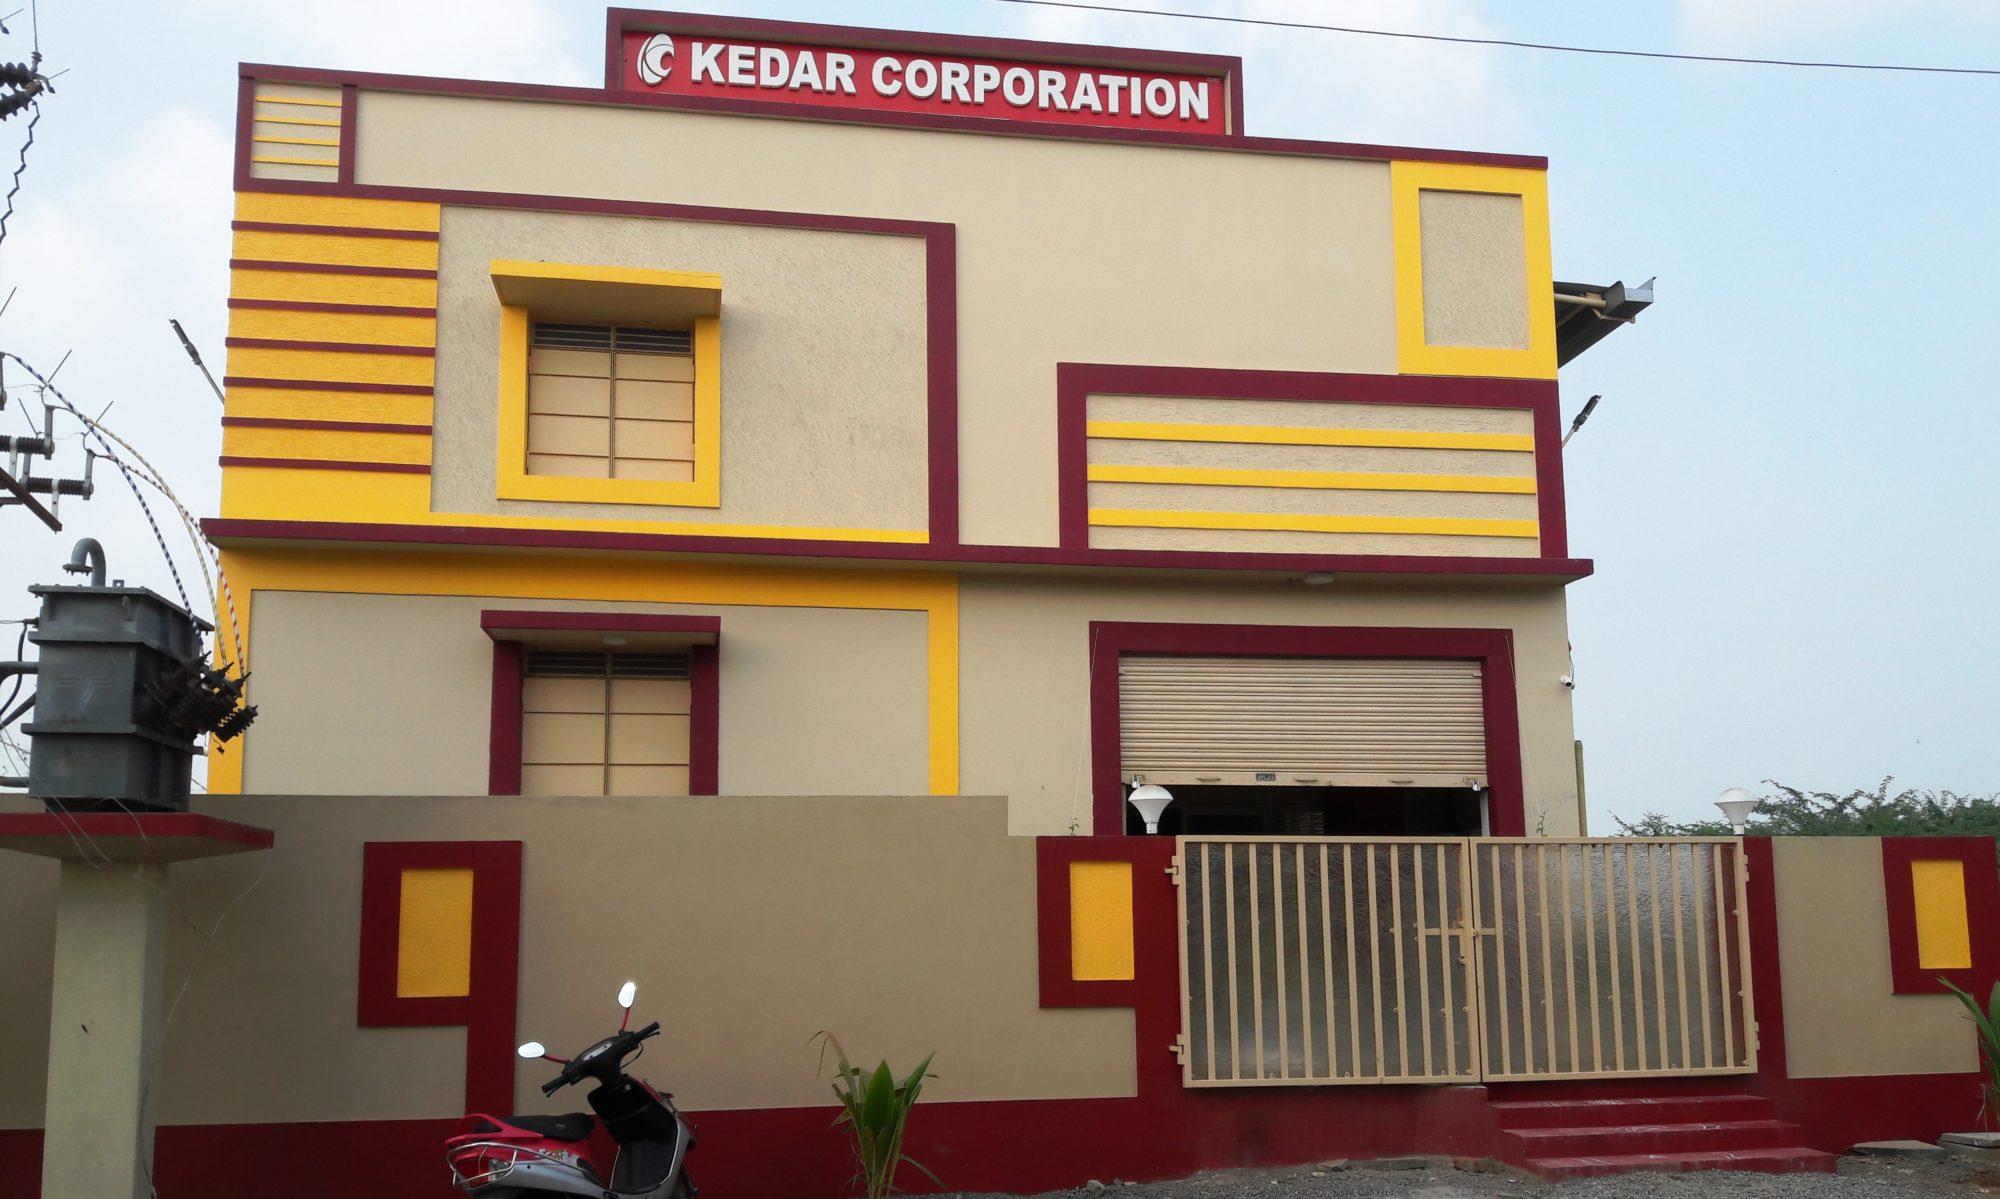 KEDAR CORPORATION